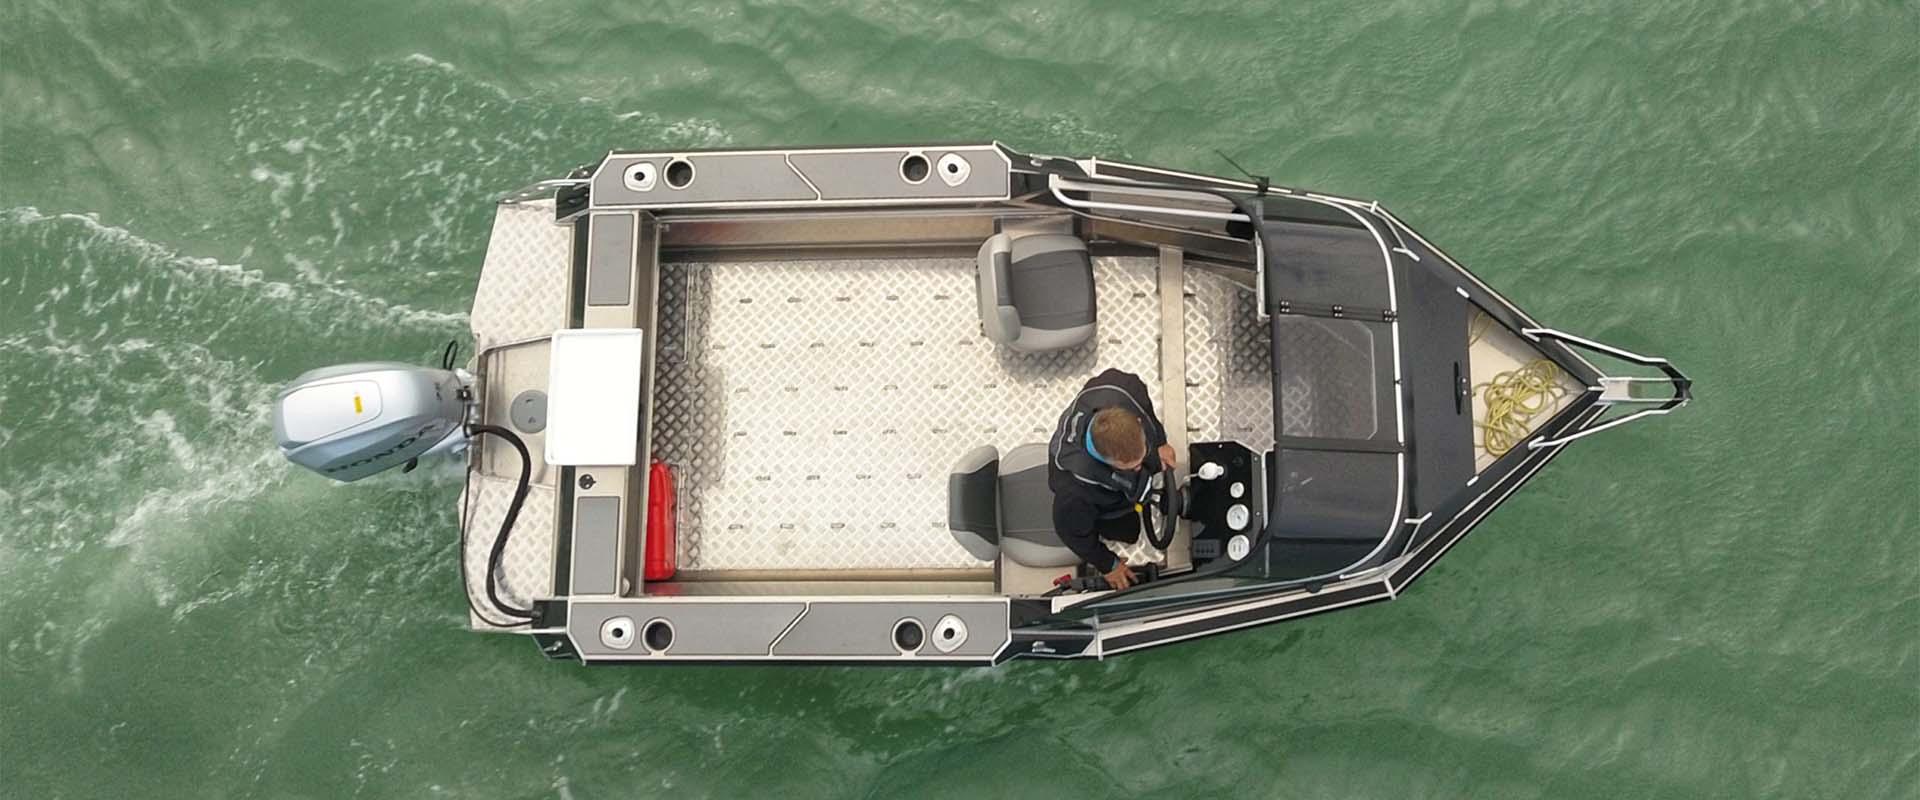 DNa Boats 502XC - Rodney Marine 4